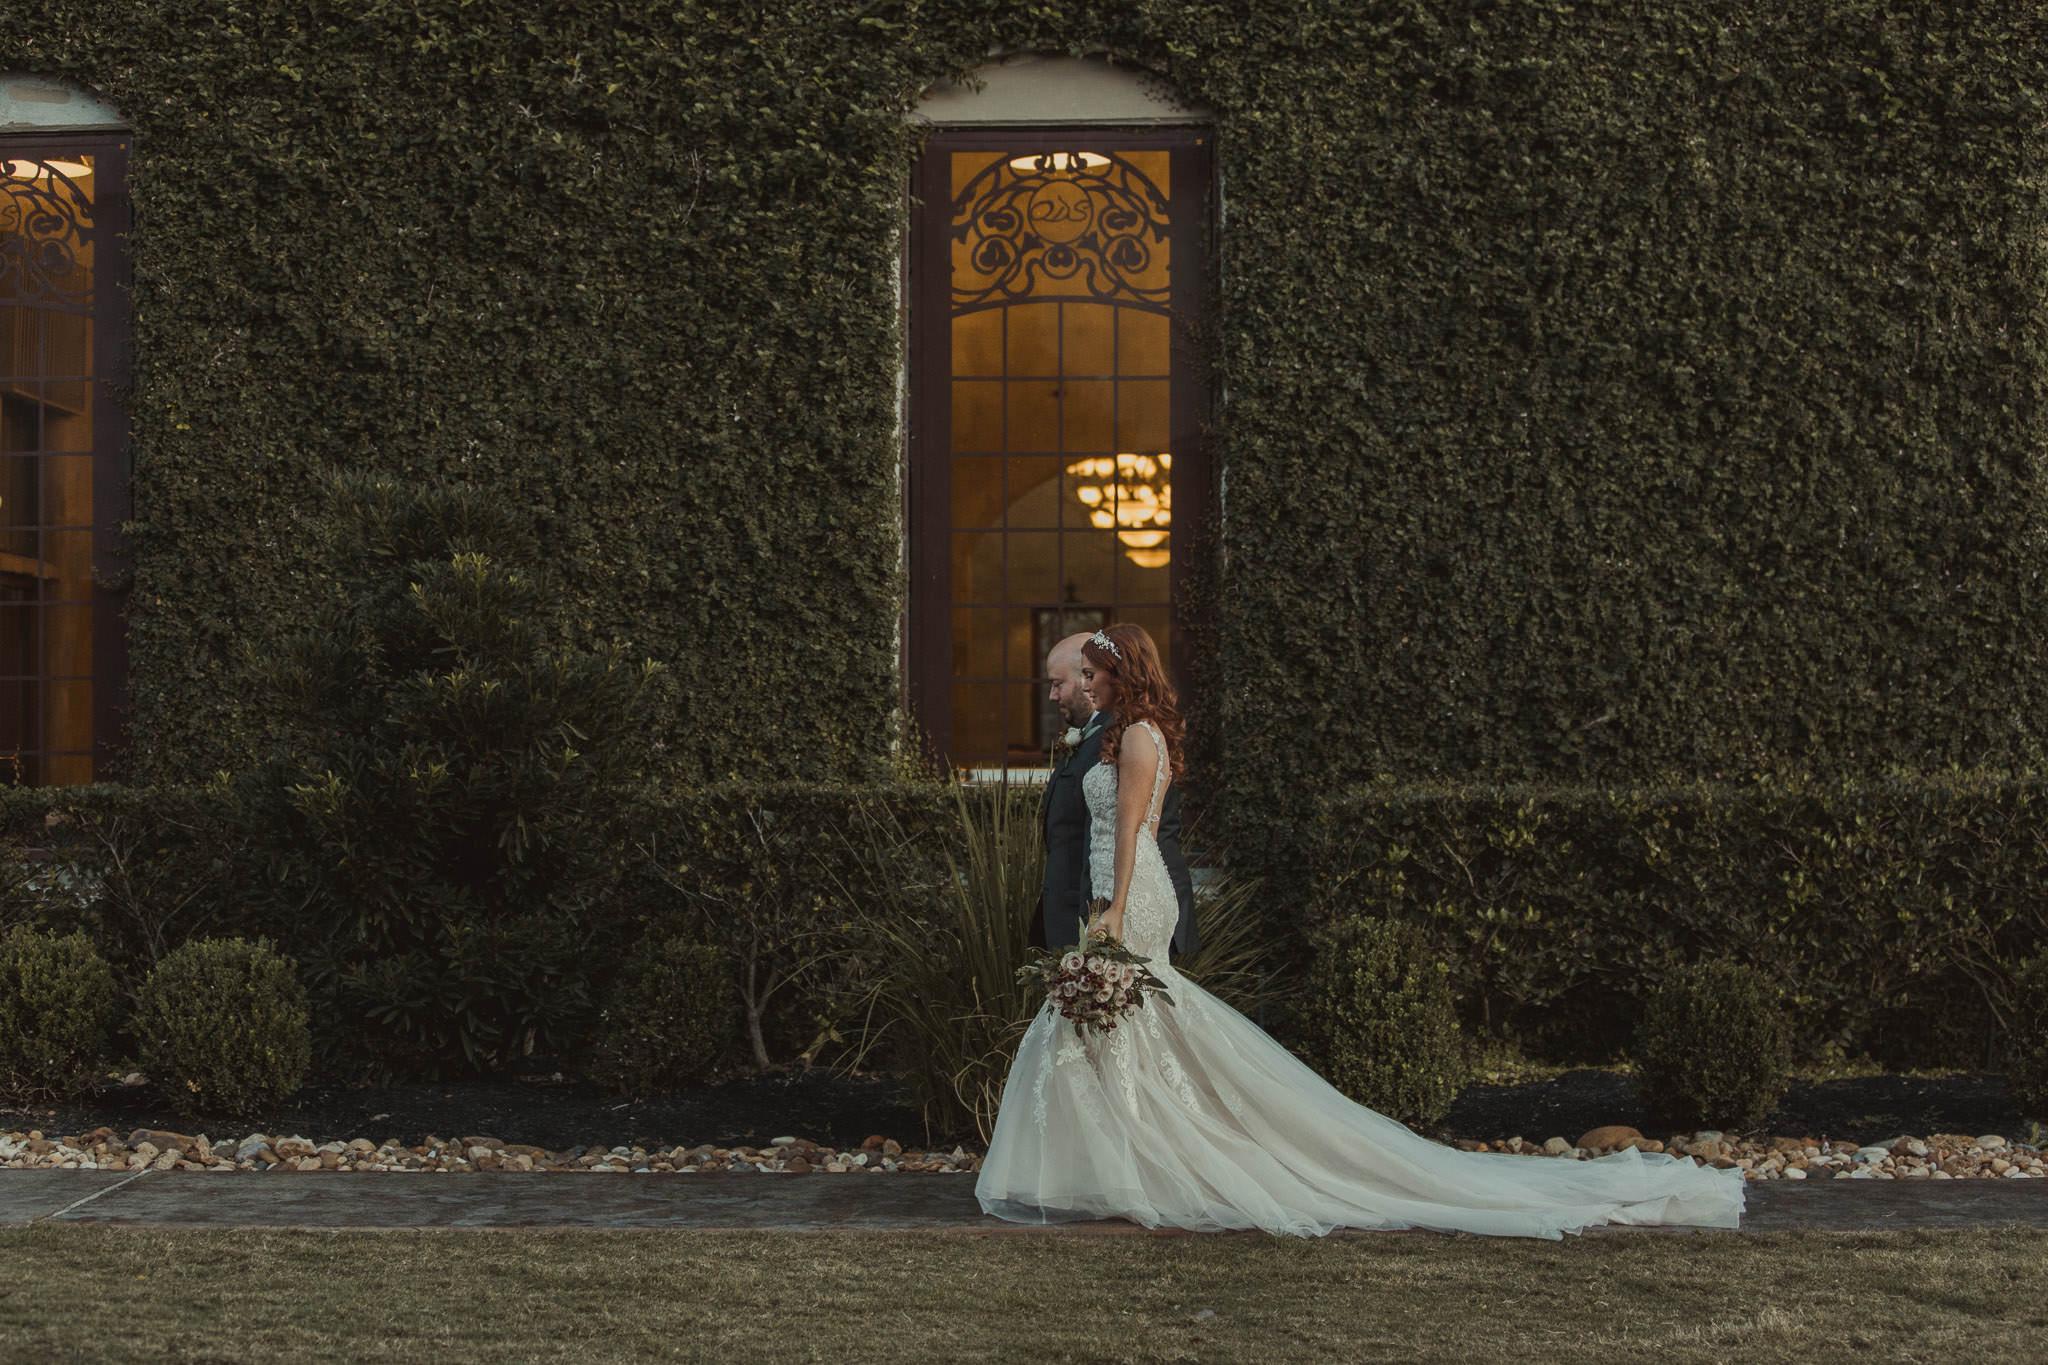 Cynthia-Curtis-Olde-Dobbine-Station-Houston-Wedding-Photographer-sm-78.jpg